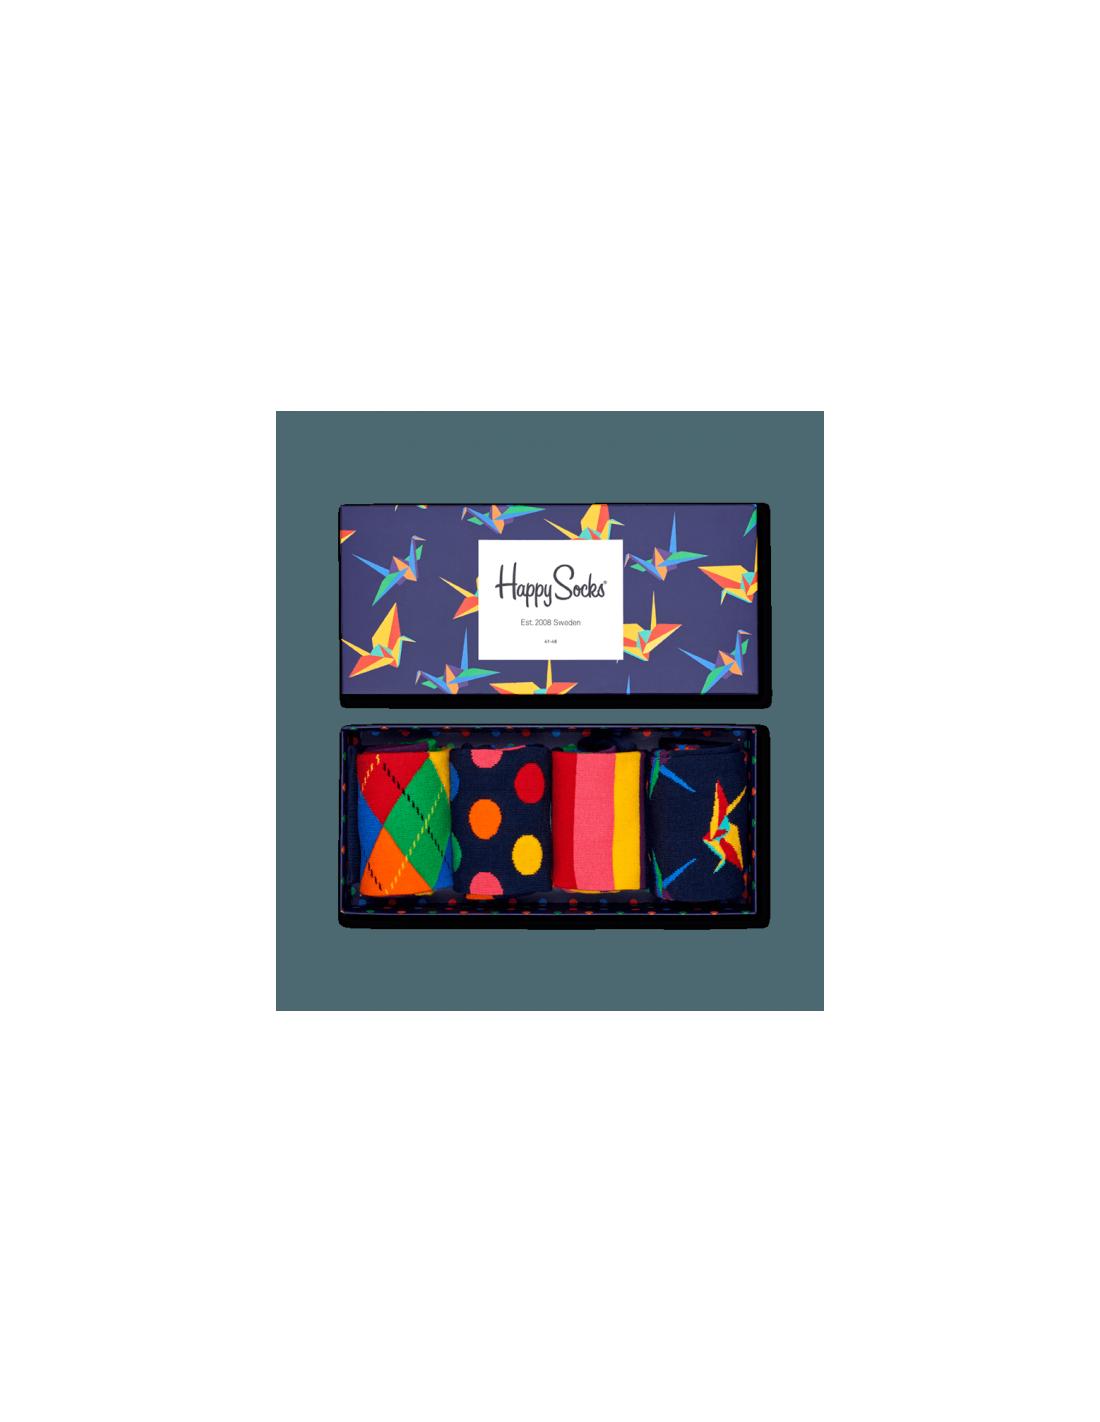 bo te cadeau 4 paires chaussettes origami happy socks. Black Bedroom Furniture Sets. Home Design Ideas